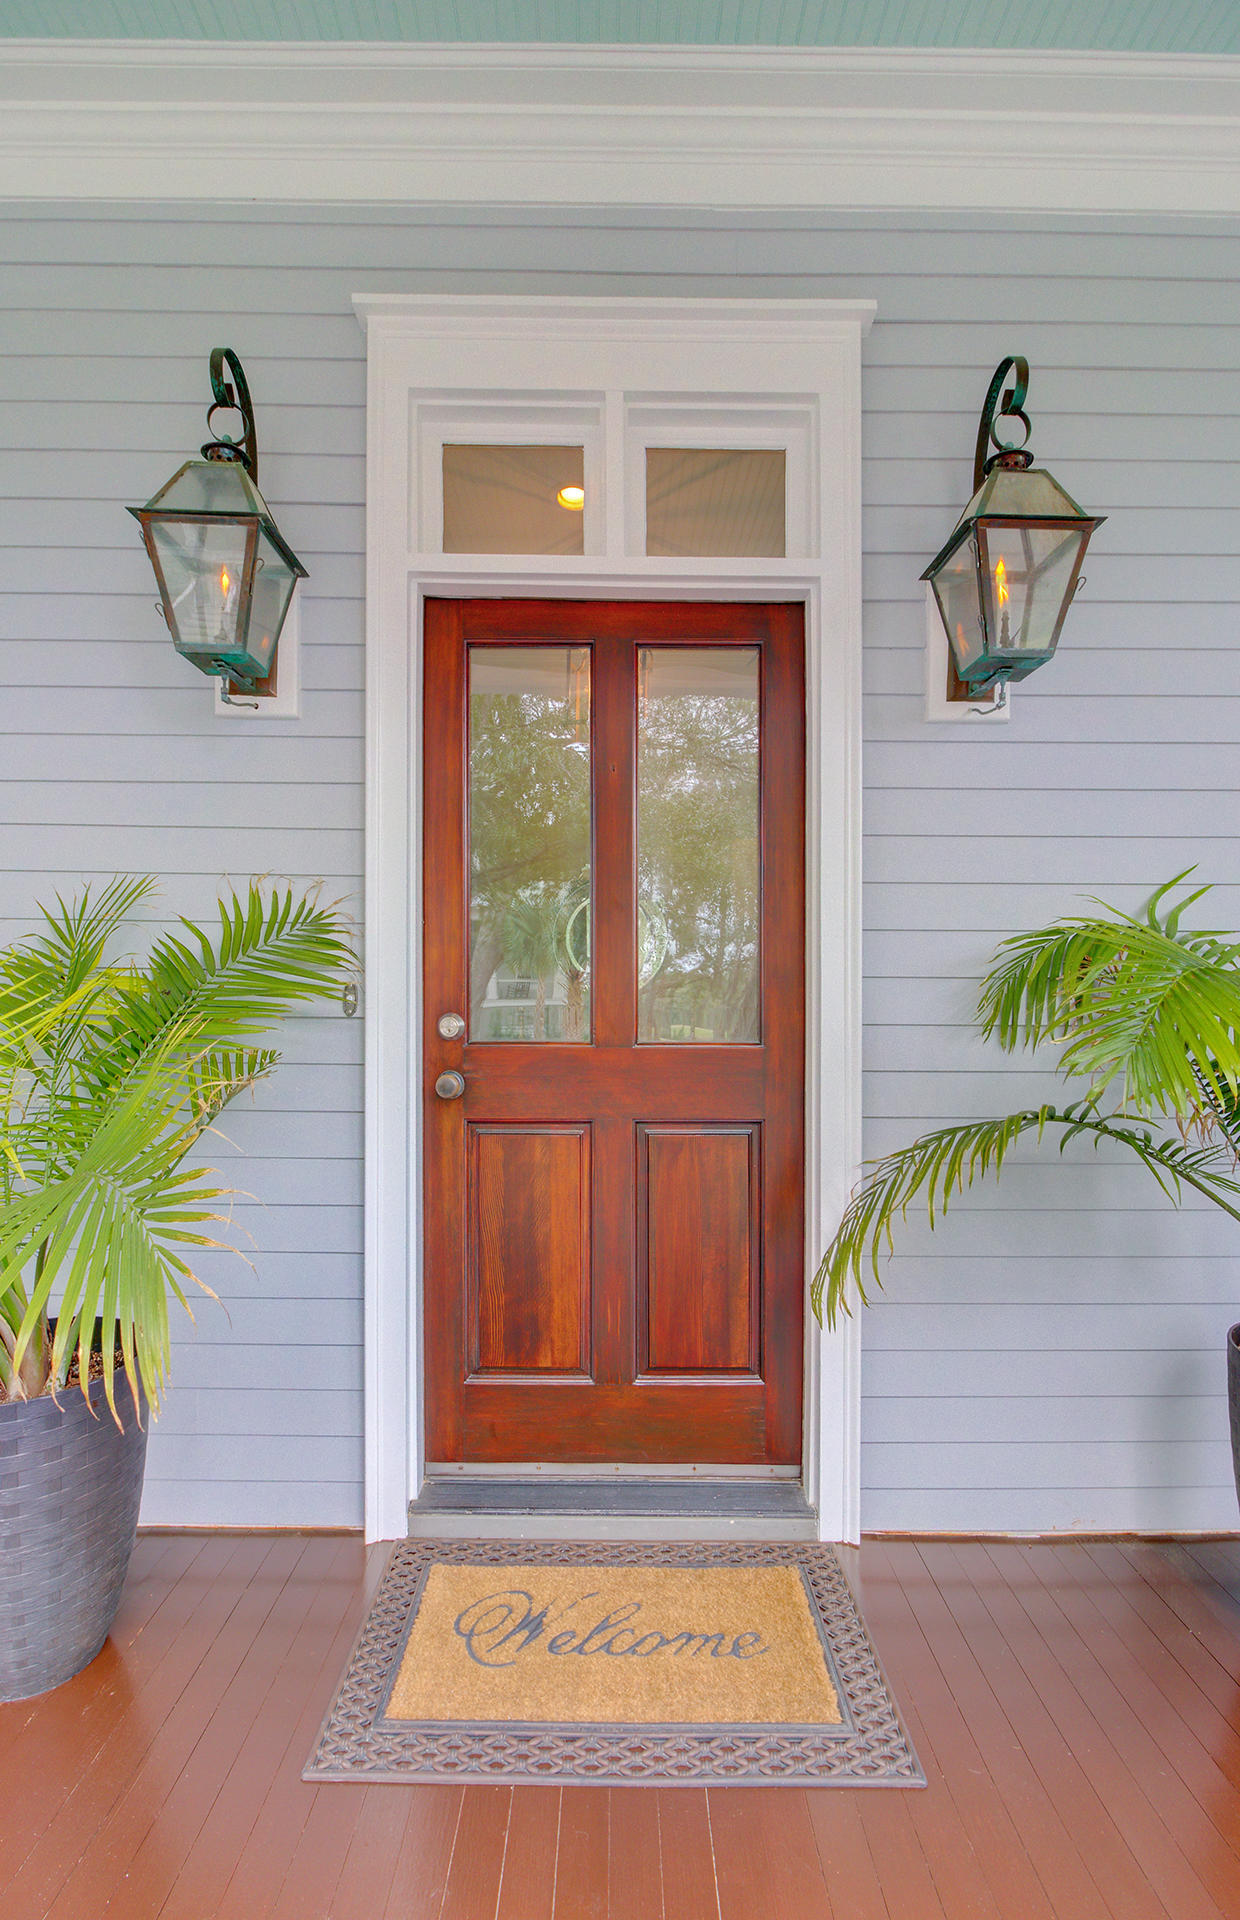 Daniel Island Park Homes For Sale - 58 Dalton, Charleston, SC - 38